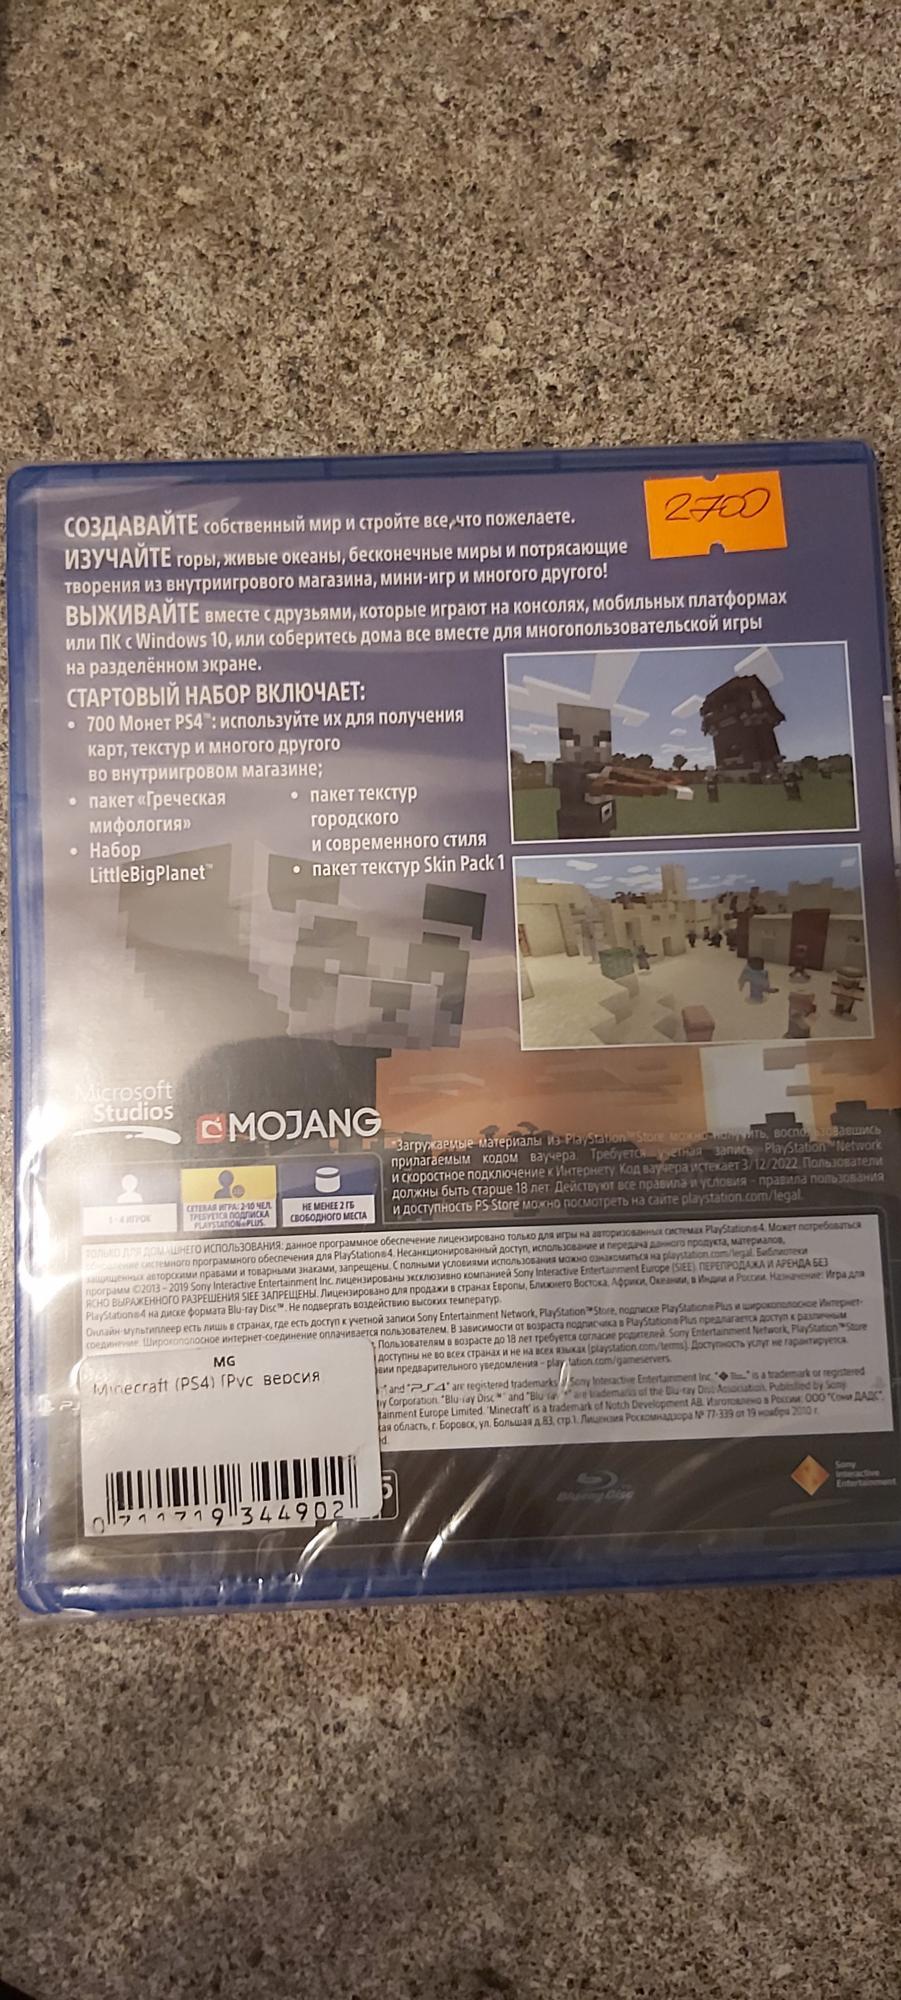 PS4 игра Sony Minecraft в Москве 89035822534 купить 3